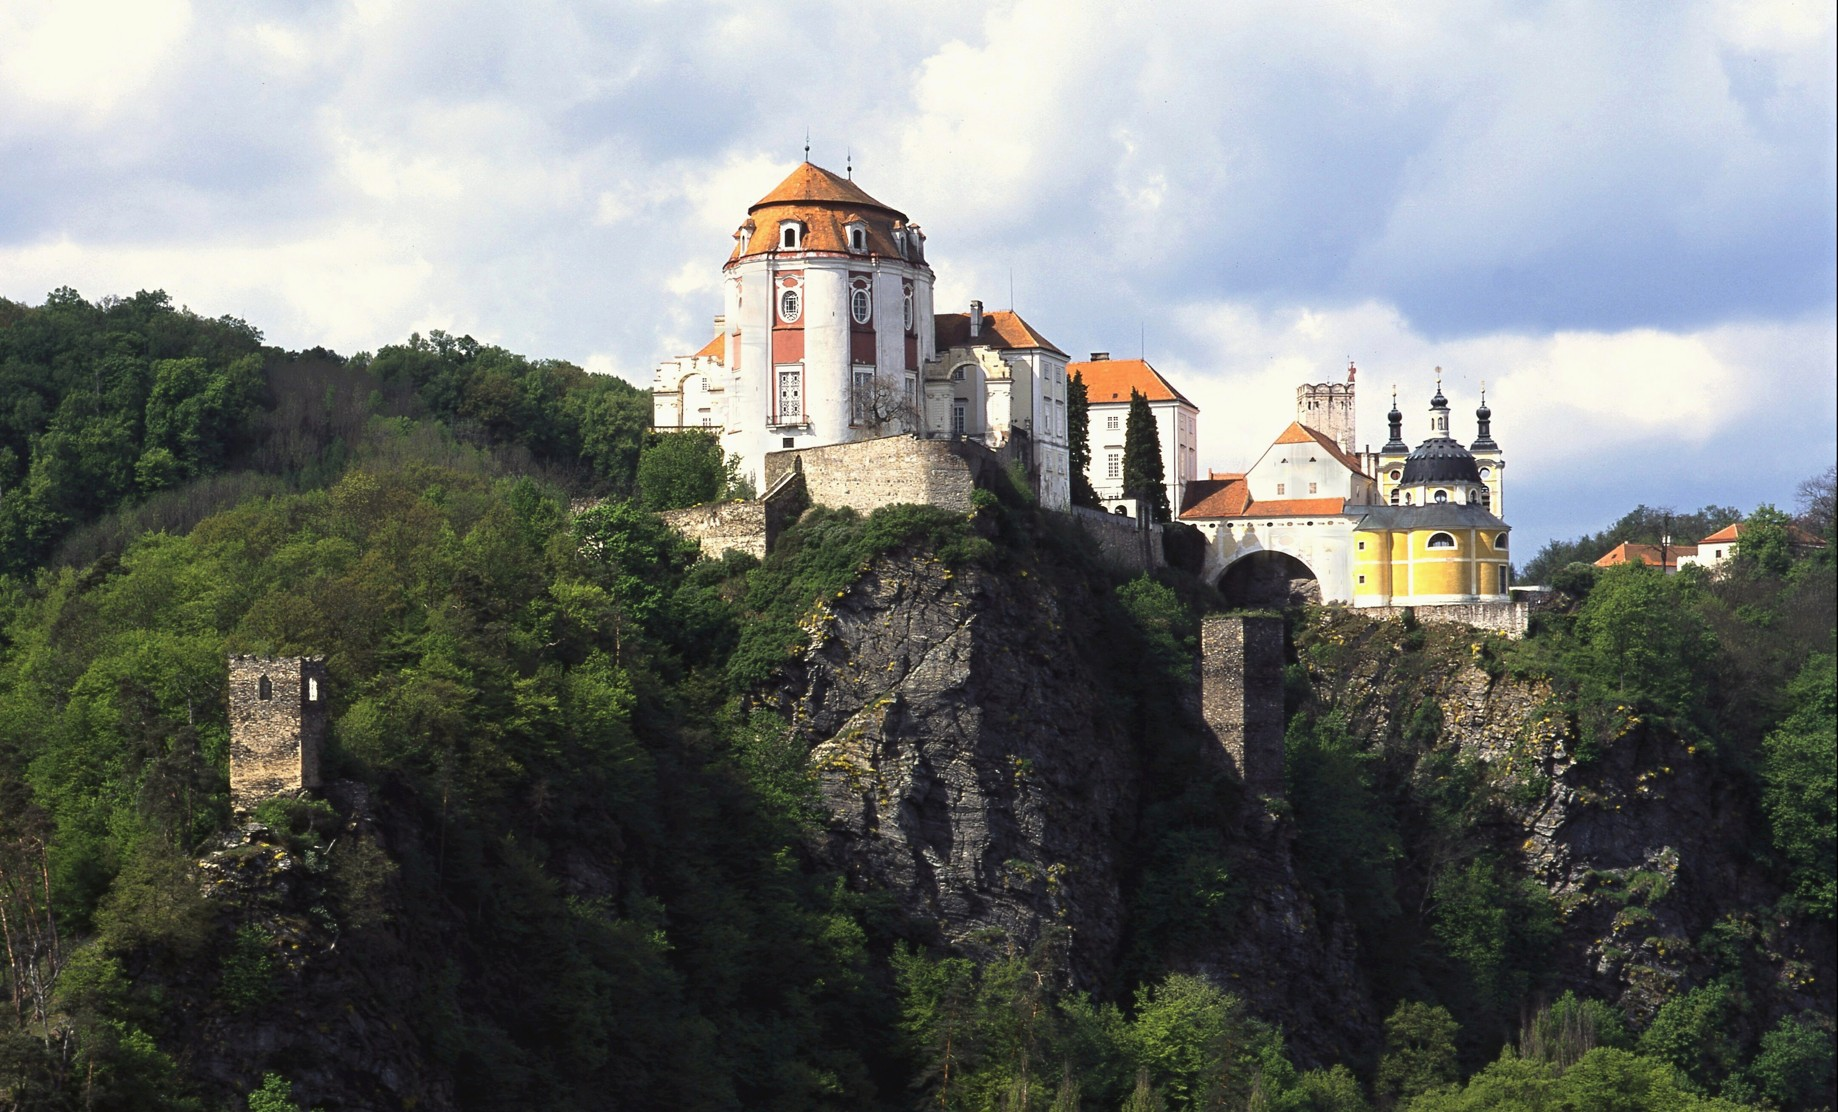 pohled na zamek s Vrani vezi1